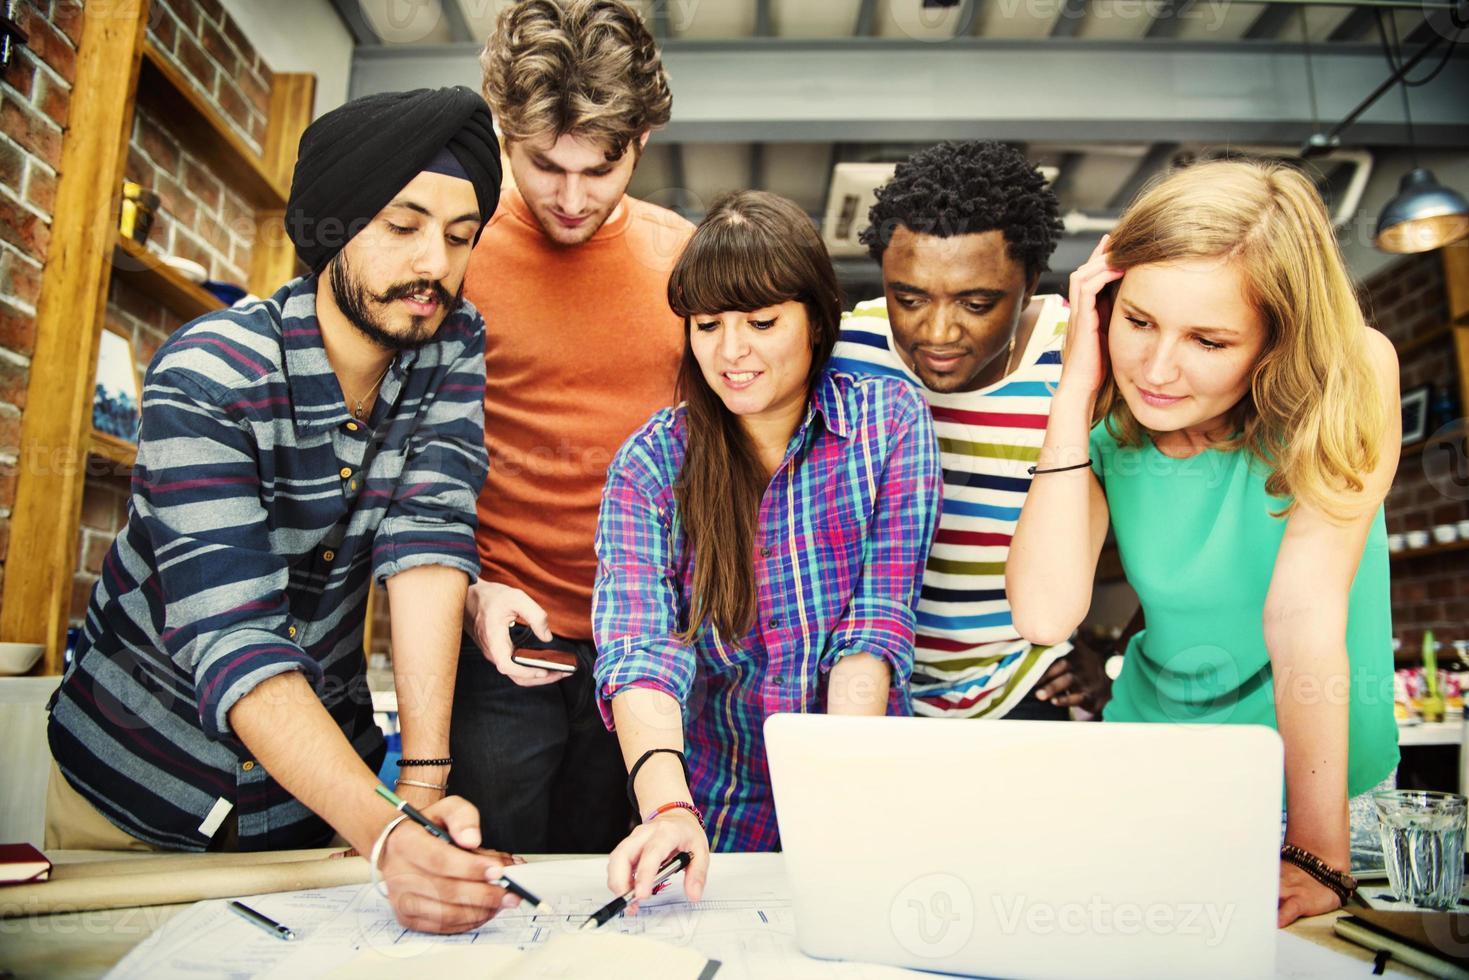 Designer Teamwork Brainstorming Planning Interior Concept photo